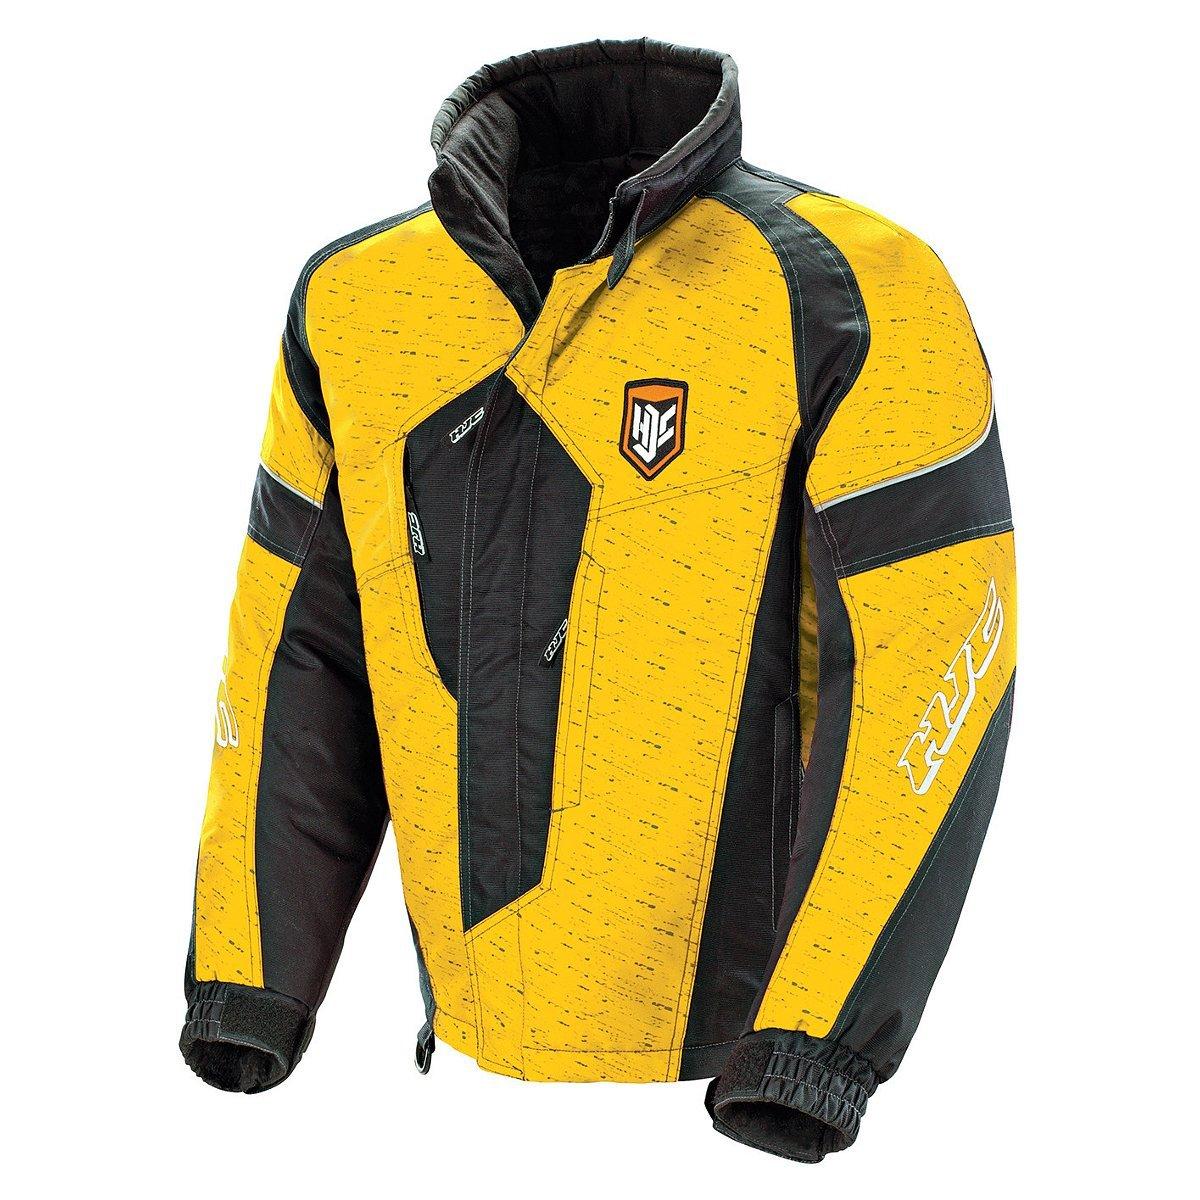 HJC Storm Men's Snow Jacket (Green/Black, Large) 1501-044